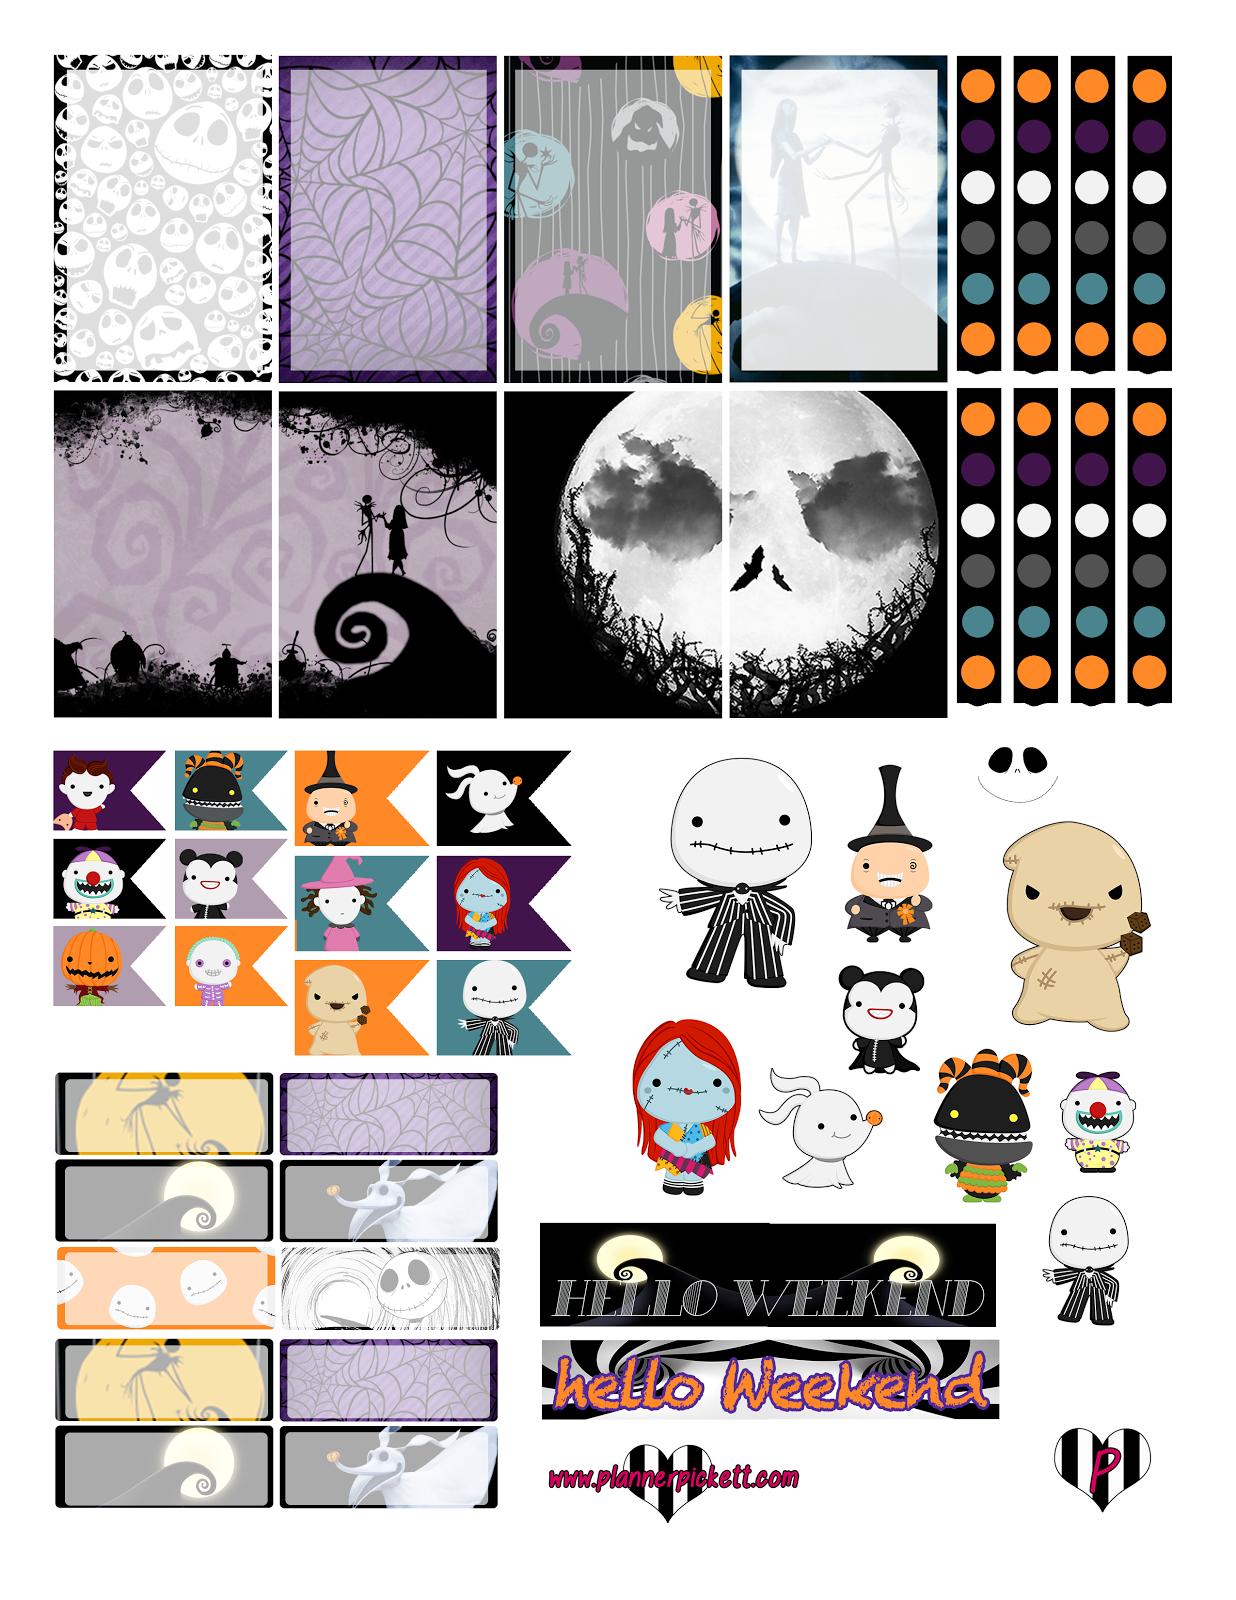 Planner Pickett Nightmare Before Christmas Free Halloween Planner Sticker Printable